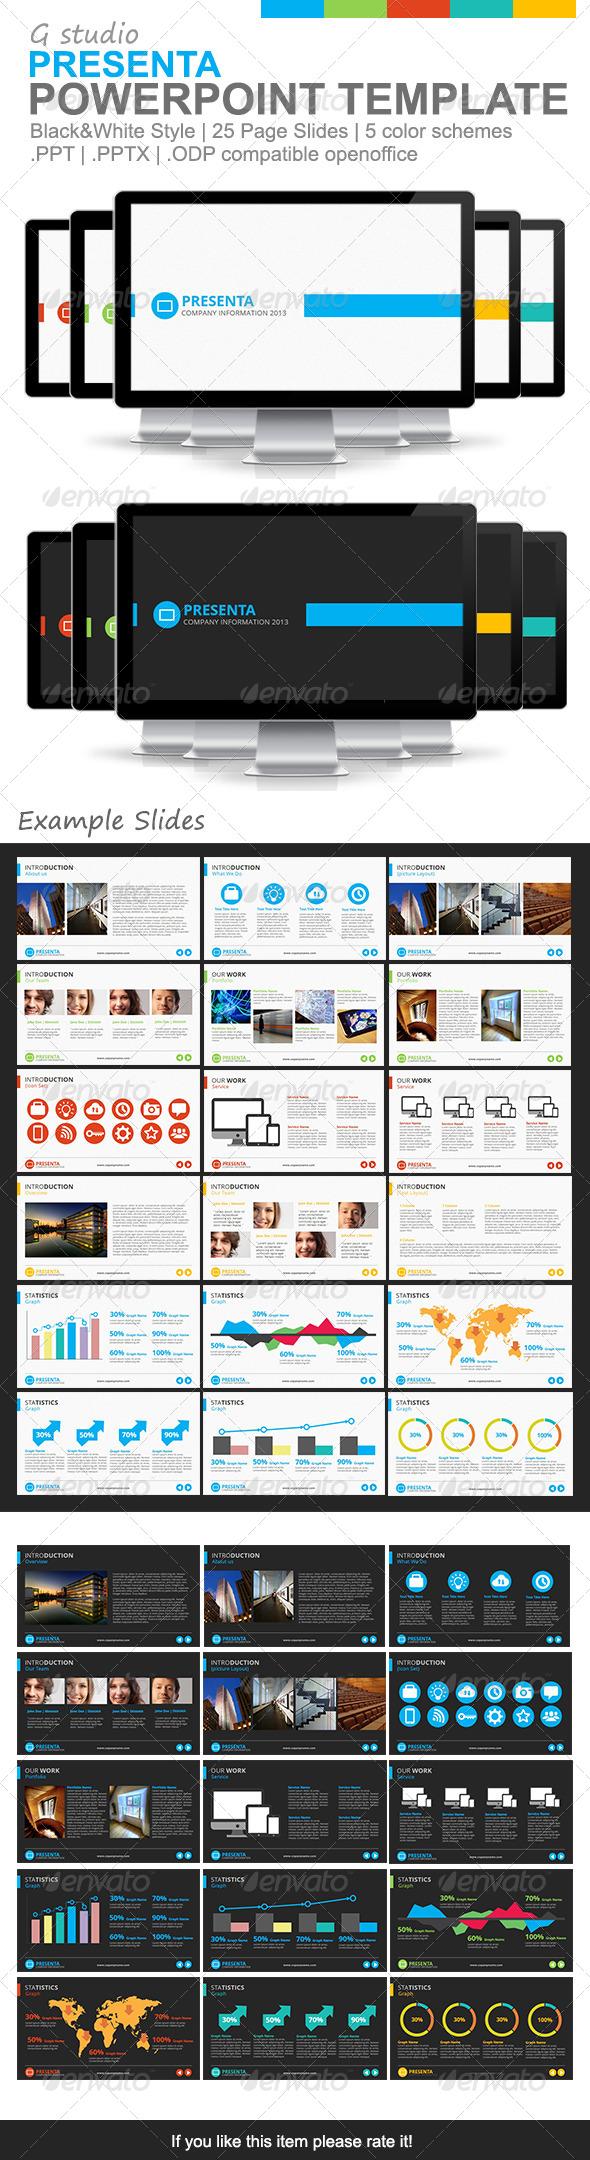 Gstudio Presenta Powerpoint Template - Powerpoint Templates Presentation Templates